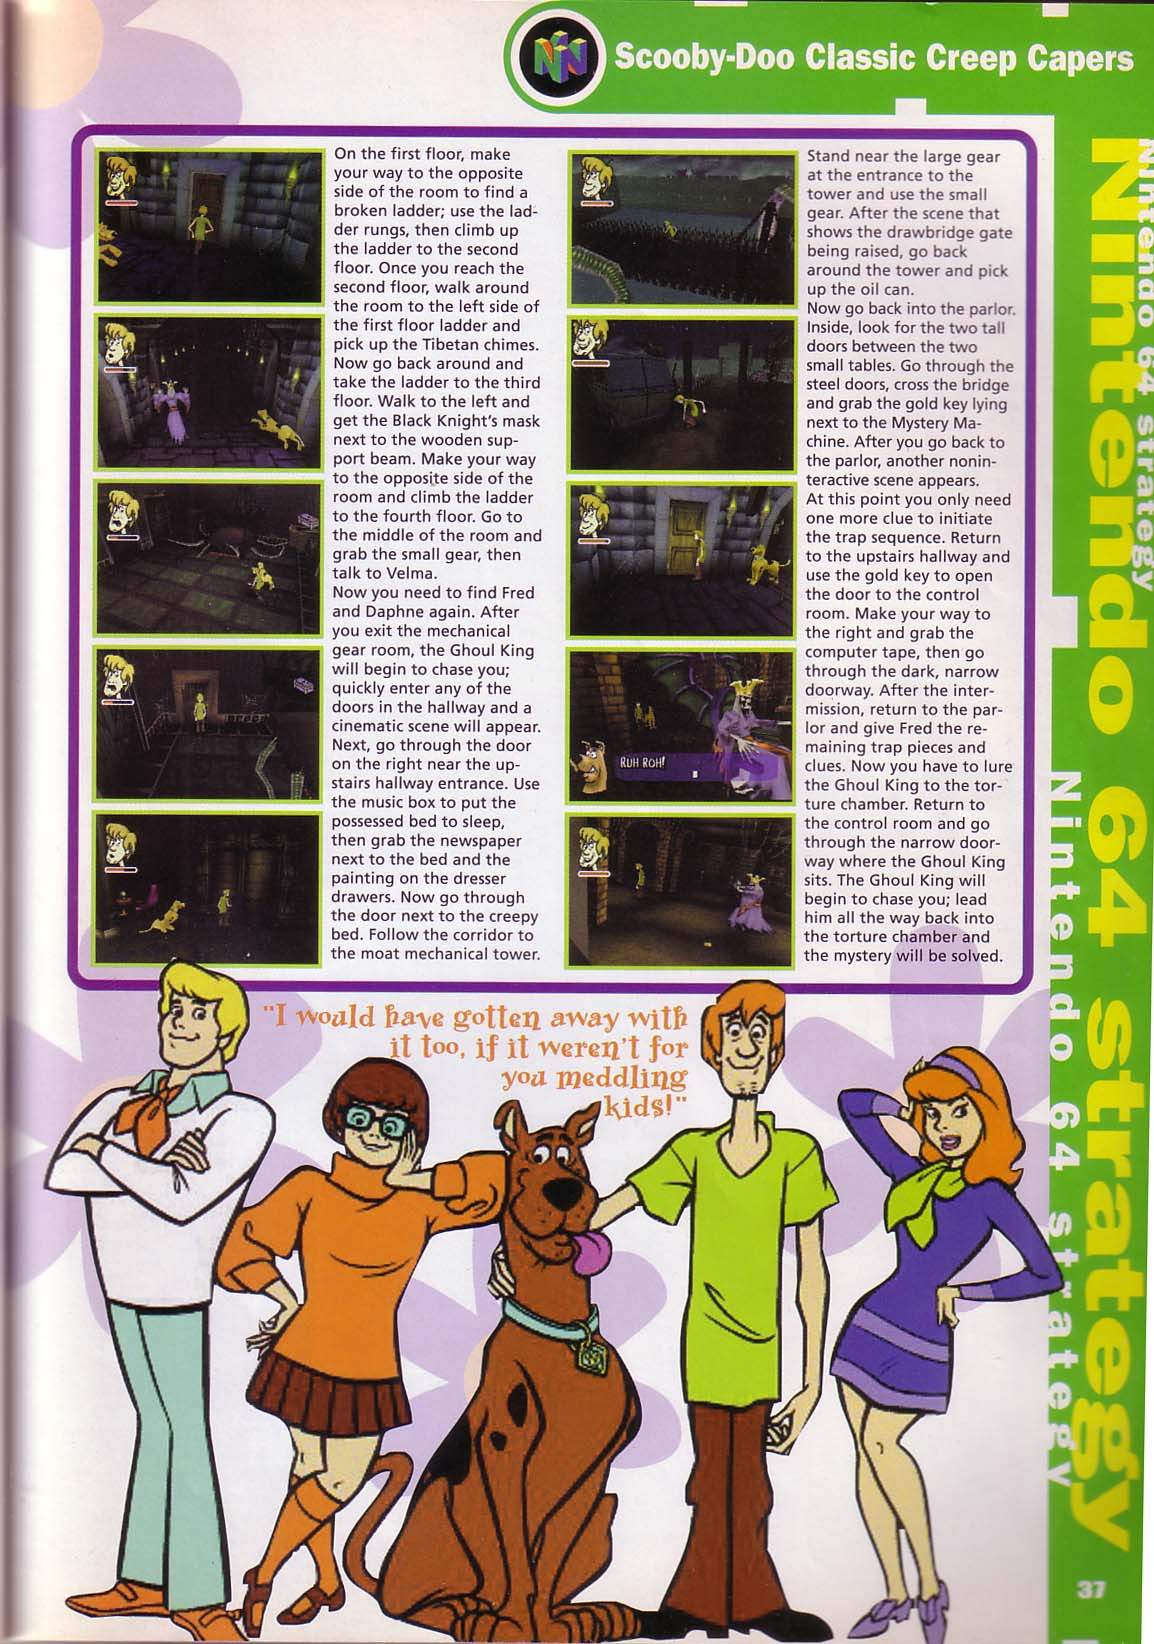 TipsandTricks_Feb_2001_ScoobyDoo_pg5_Strategy.jpg